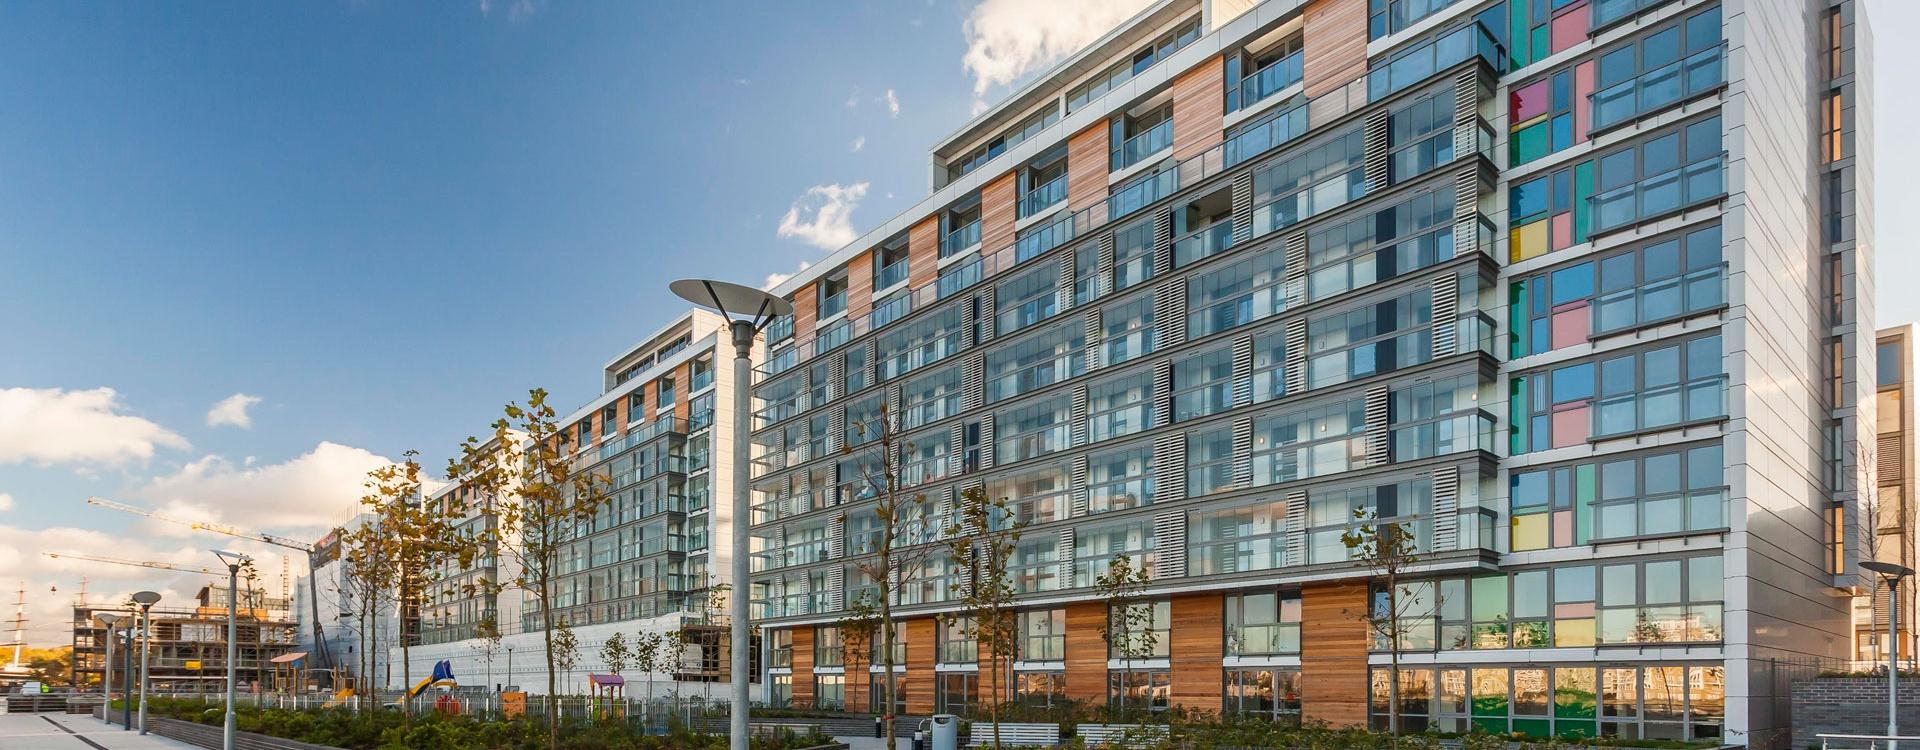 New Capital Quay image